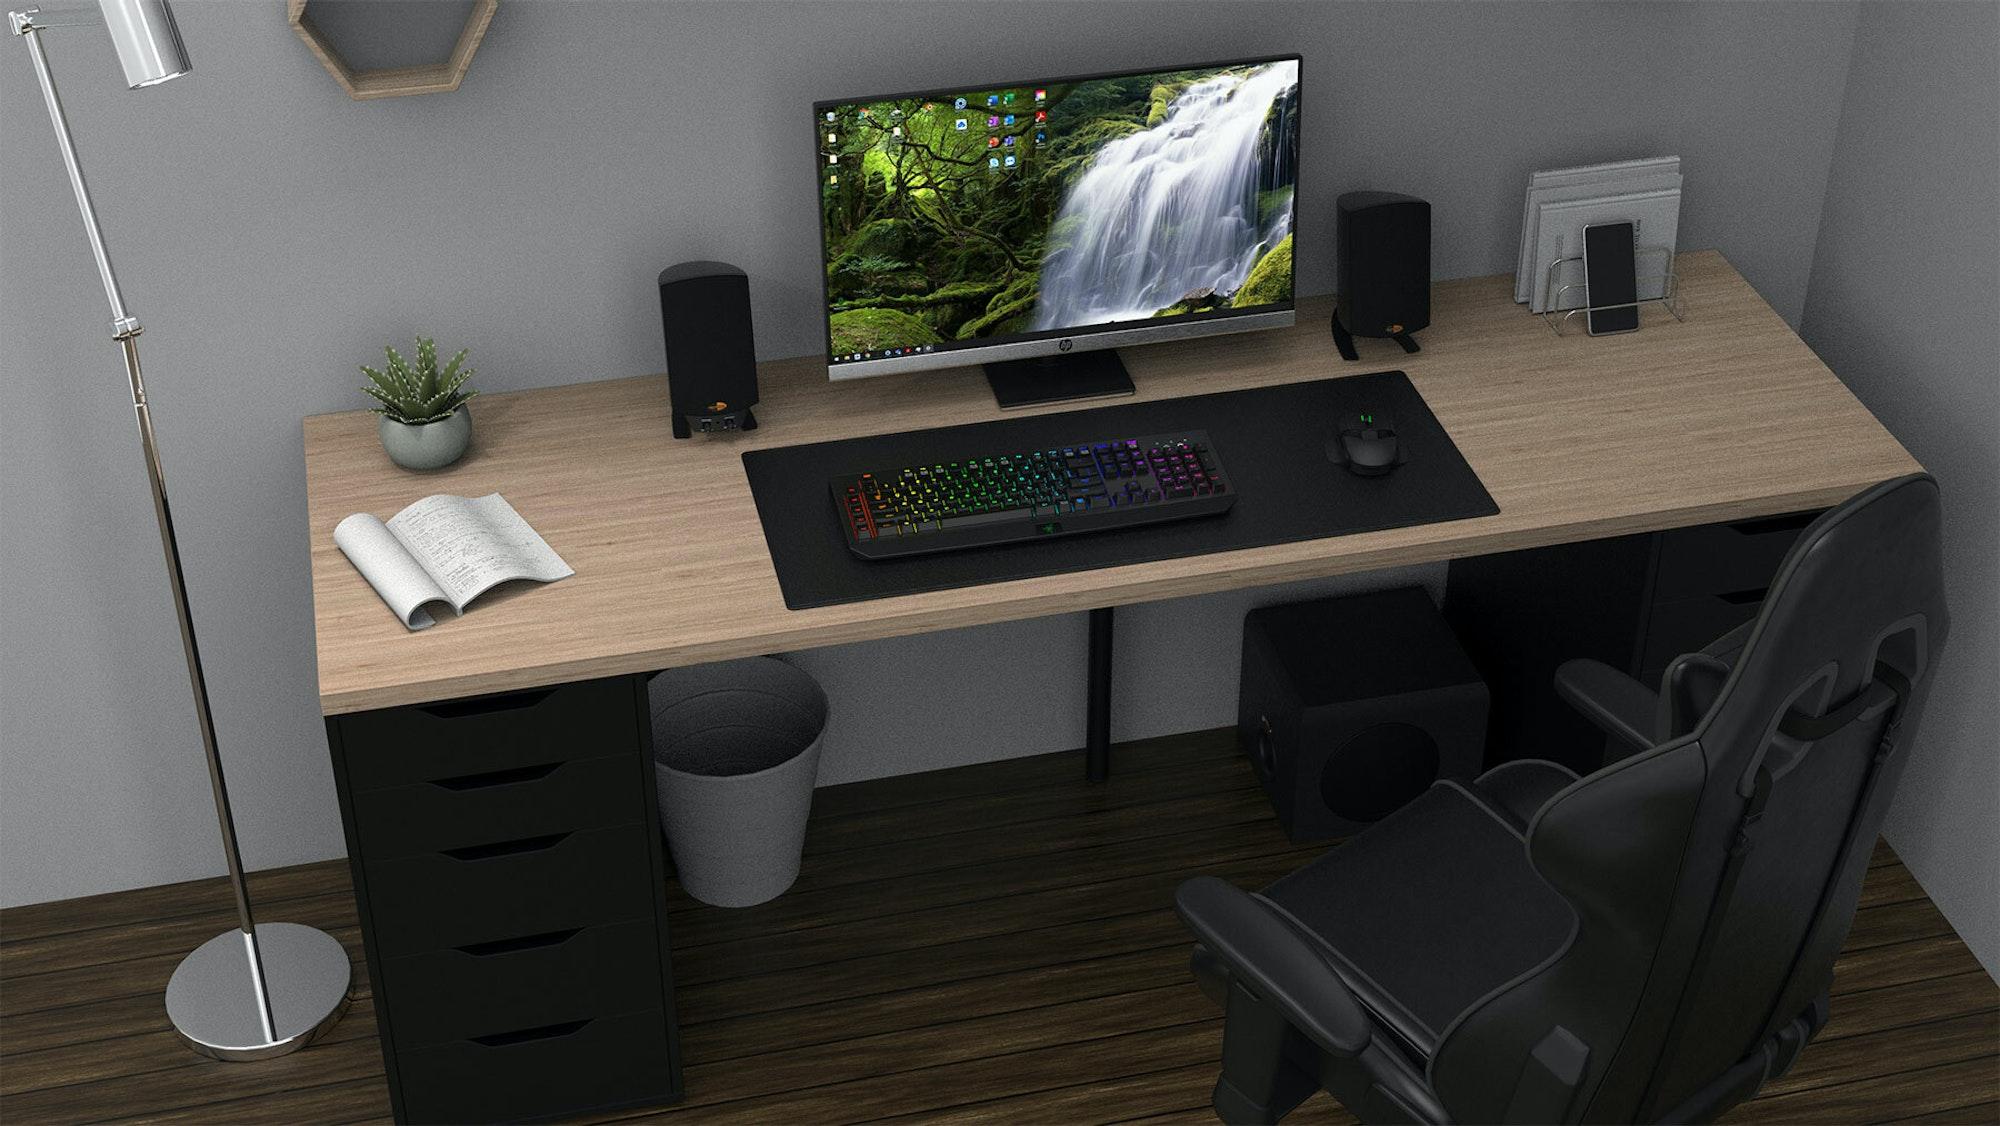 Klipsch Pro Media 21 THX best computer speakers in office